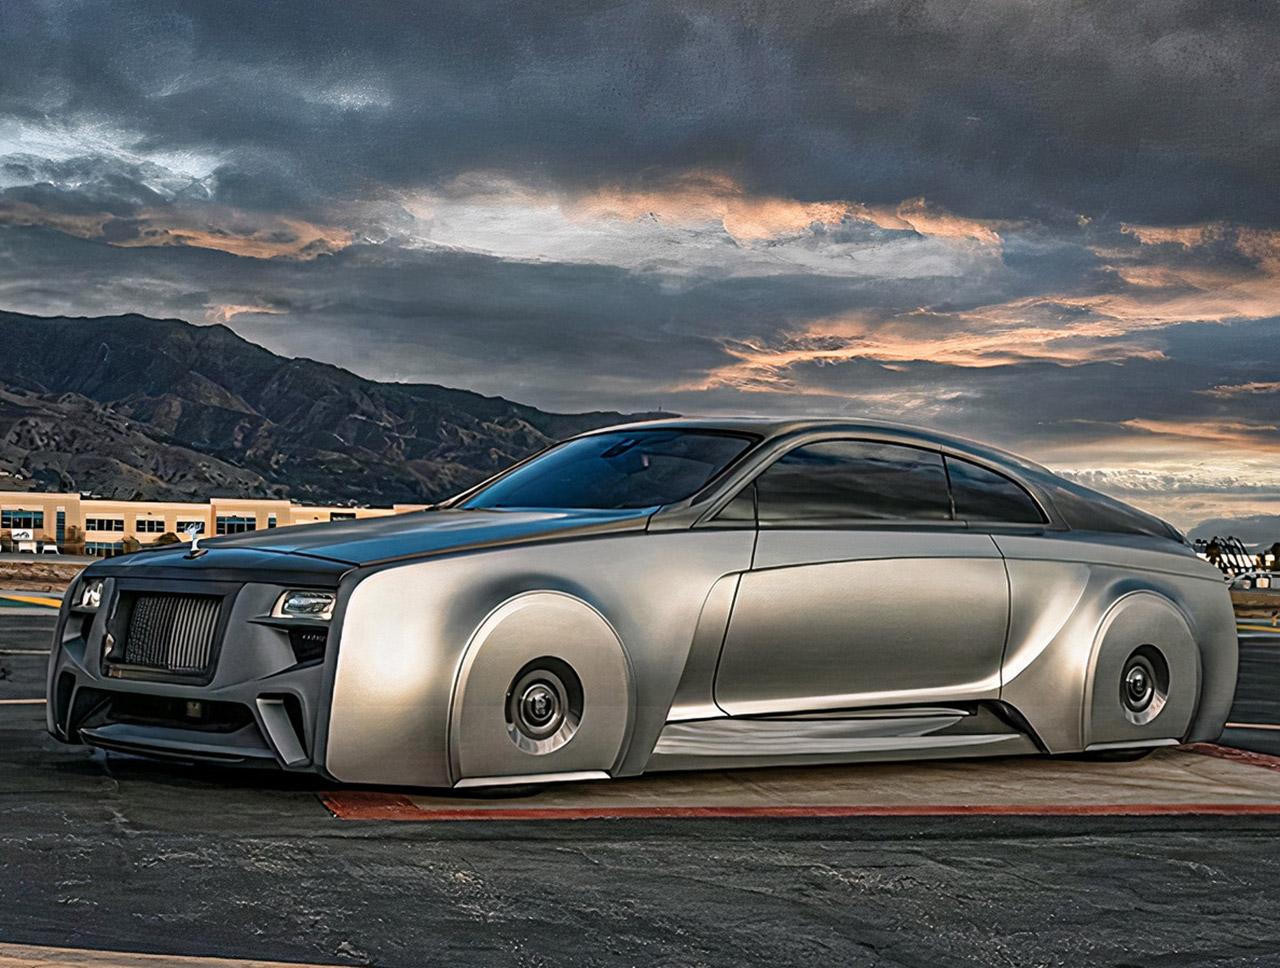 Justin Bieber West Coast Customs Rolls-Royce Wraith 103EX